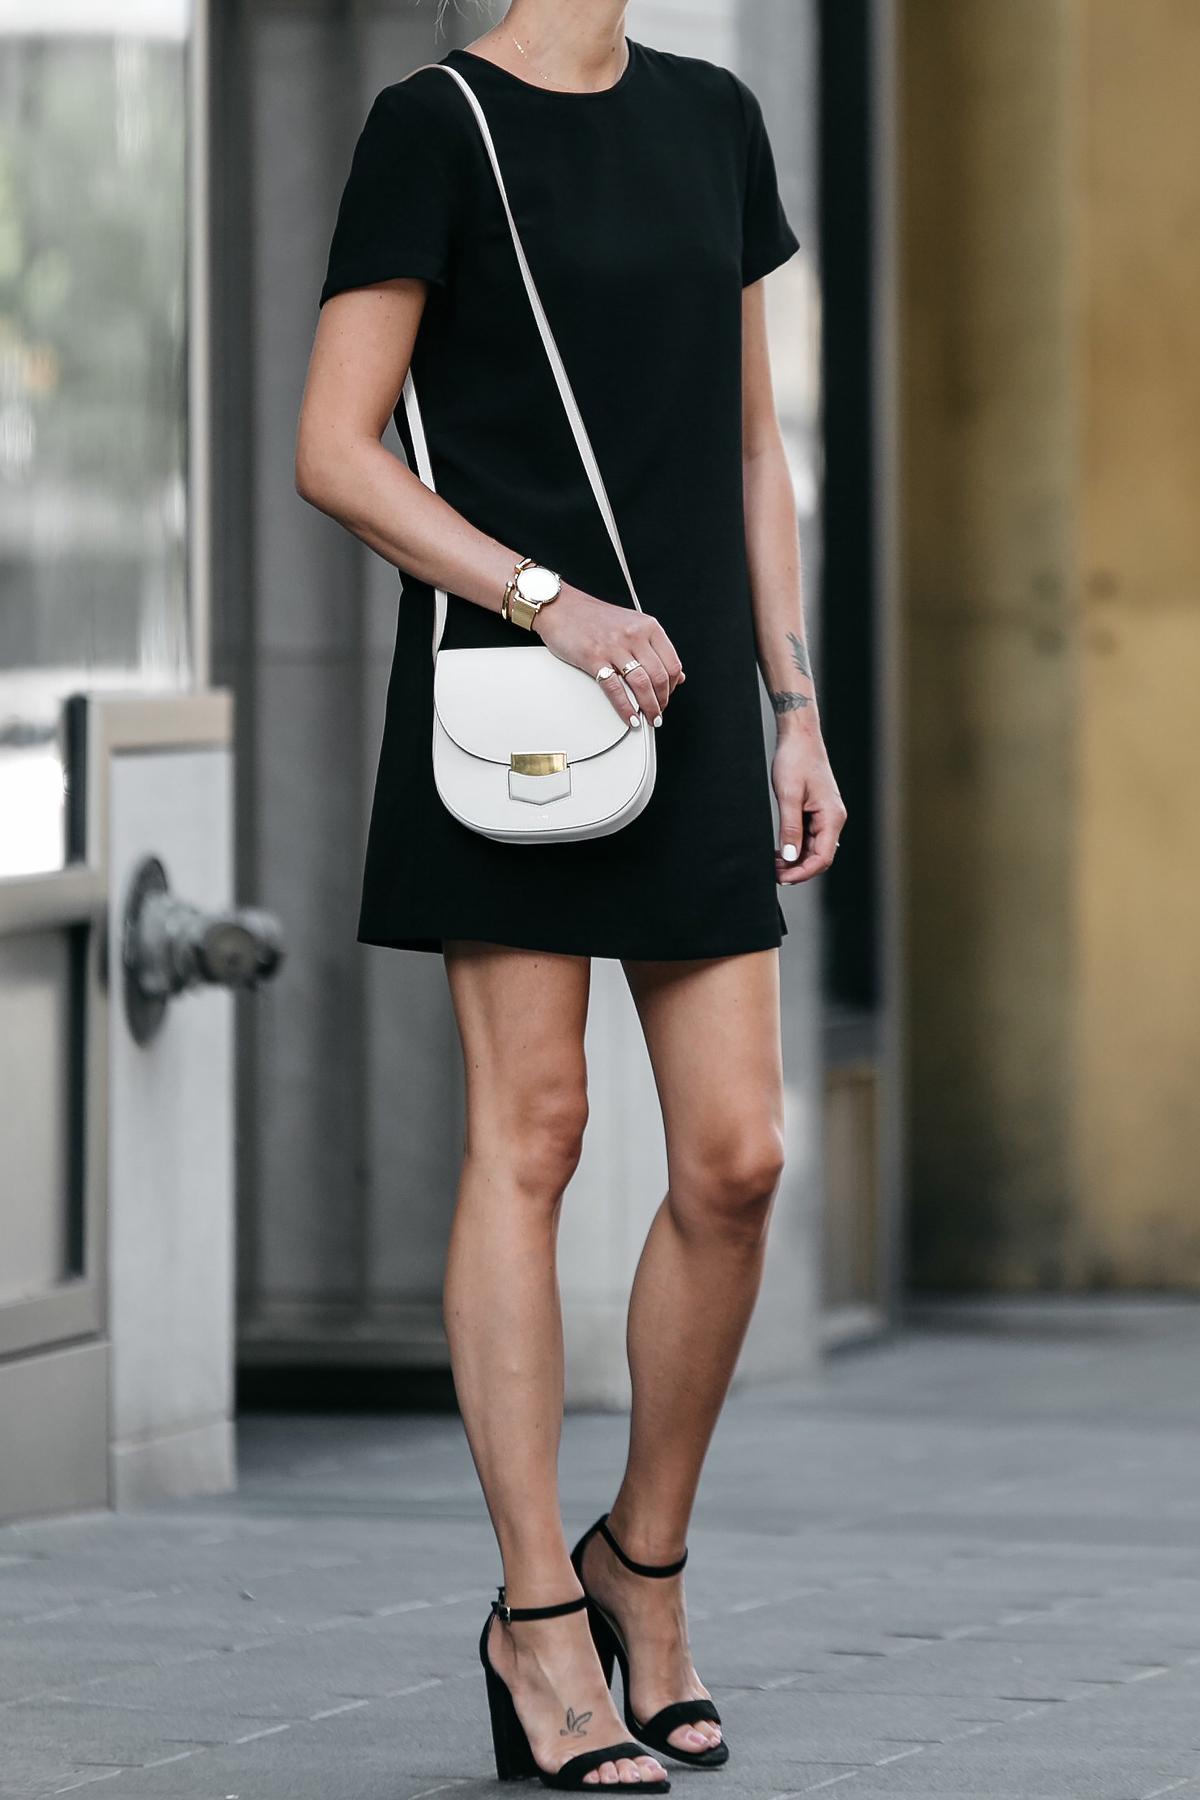 Nordstrom Black Shift Dress Outfit Black Ankle Strap Heeled Sandals Celine White Trotteur Handbag Fashion Jackson Dallas Blogger Fashion Blogger Street Style